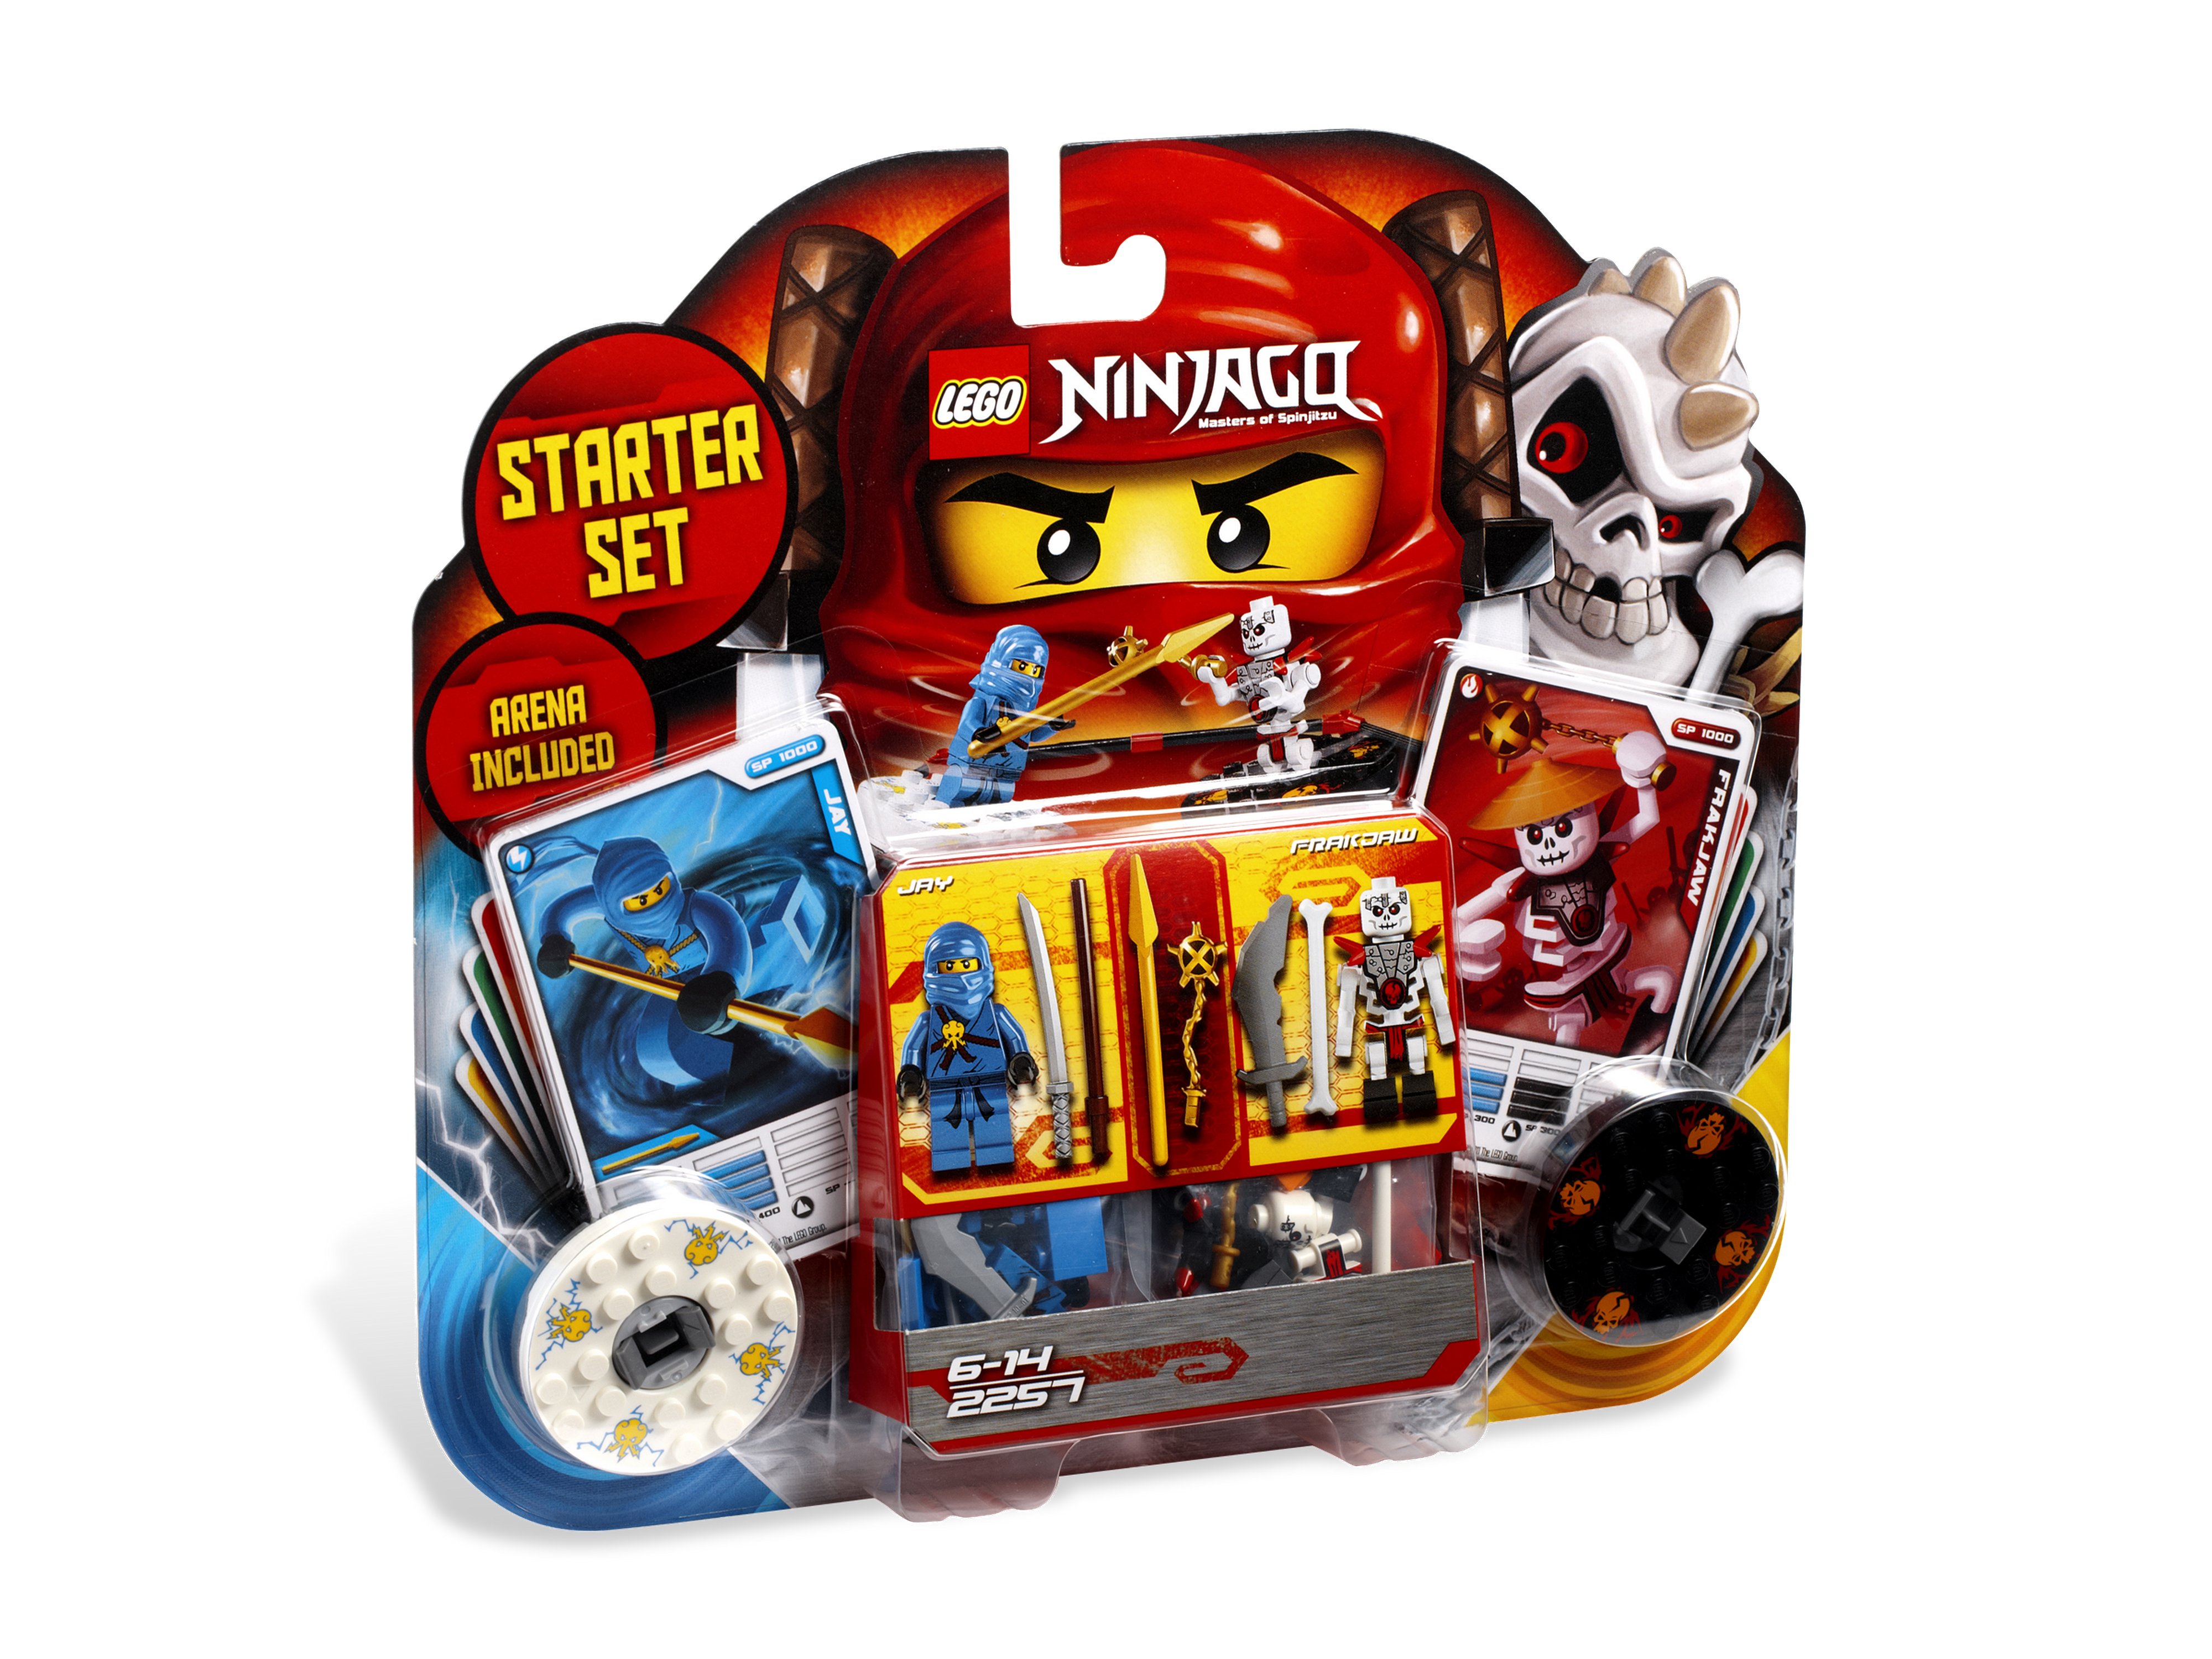 spinjitzu starter set - Ninjago Spinjitzu